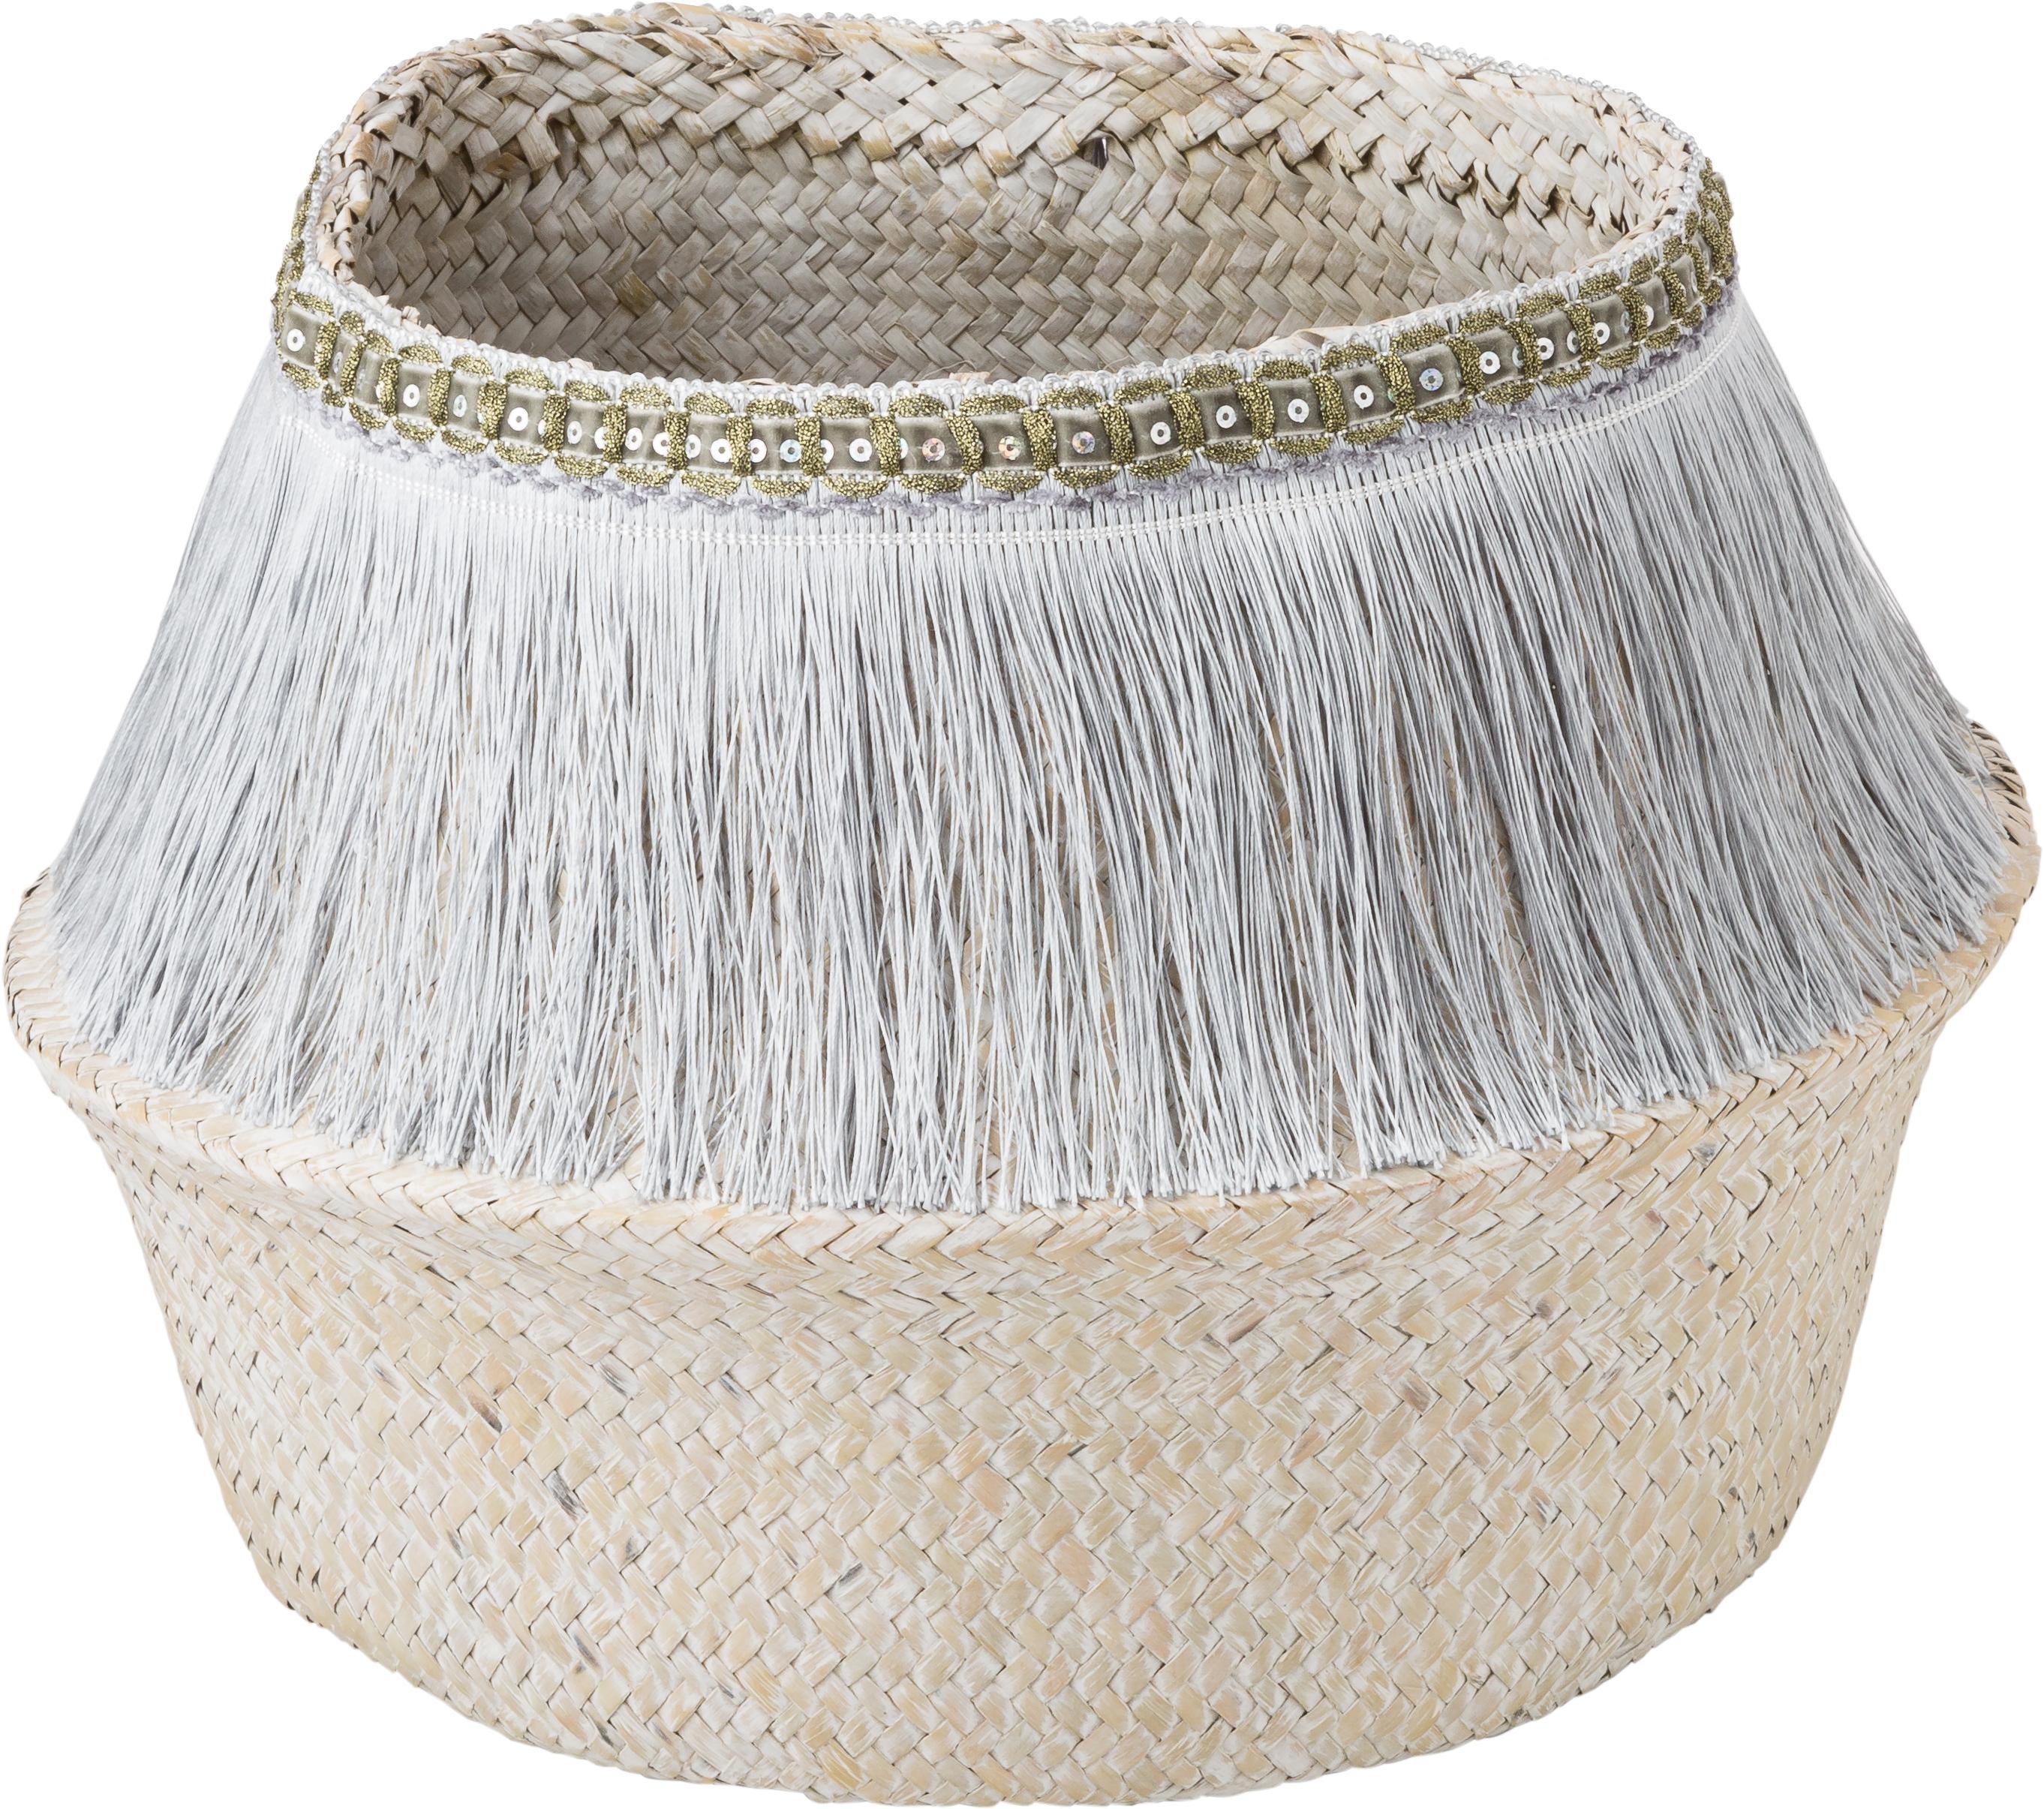 Handgemaakte opbergmand Frans, Mand: zeegras, Franjes: polyester, Zilverkleurig, wit, Ø 35 x H 25 cm